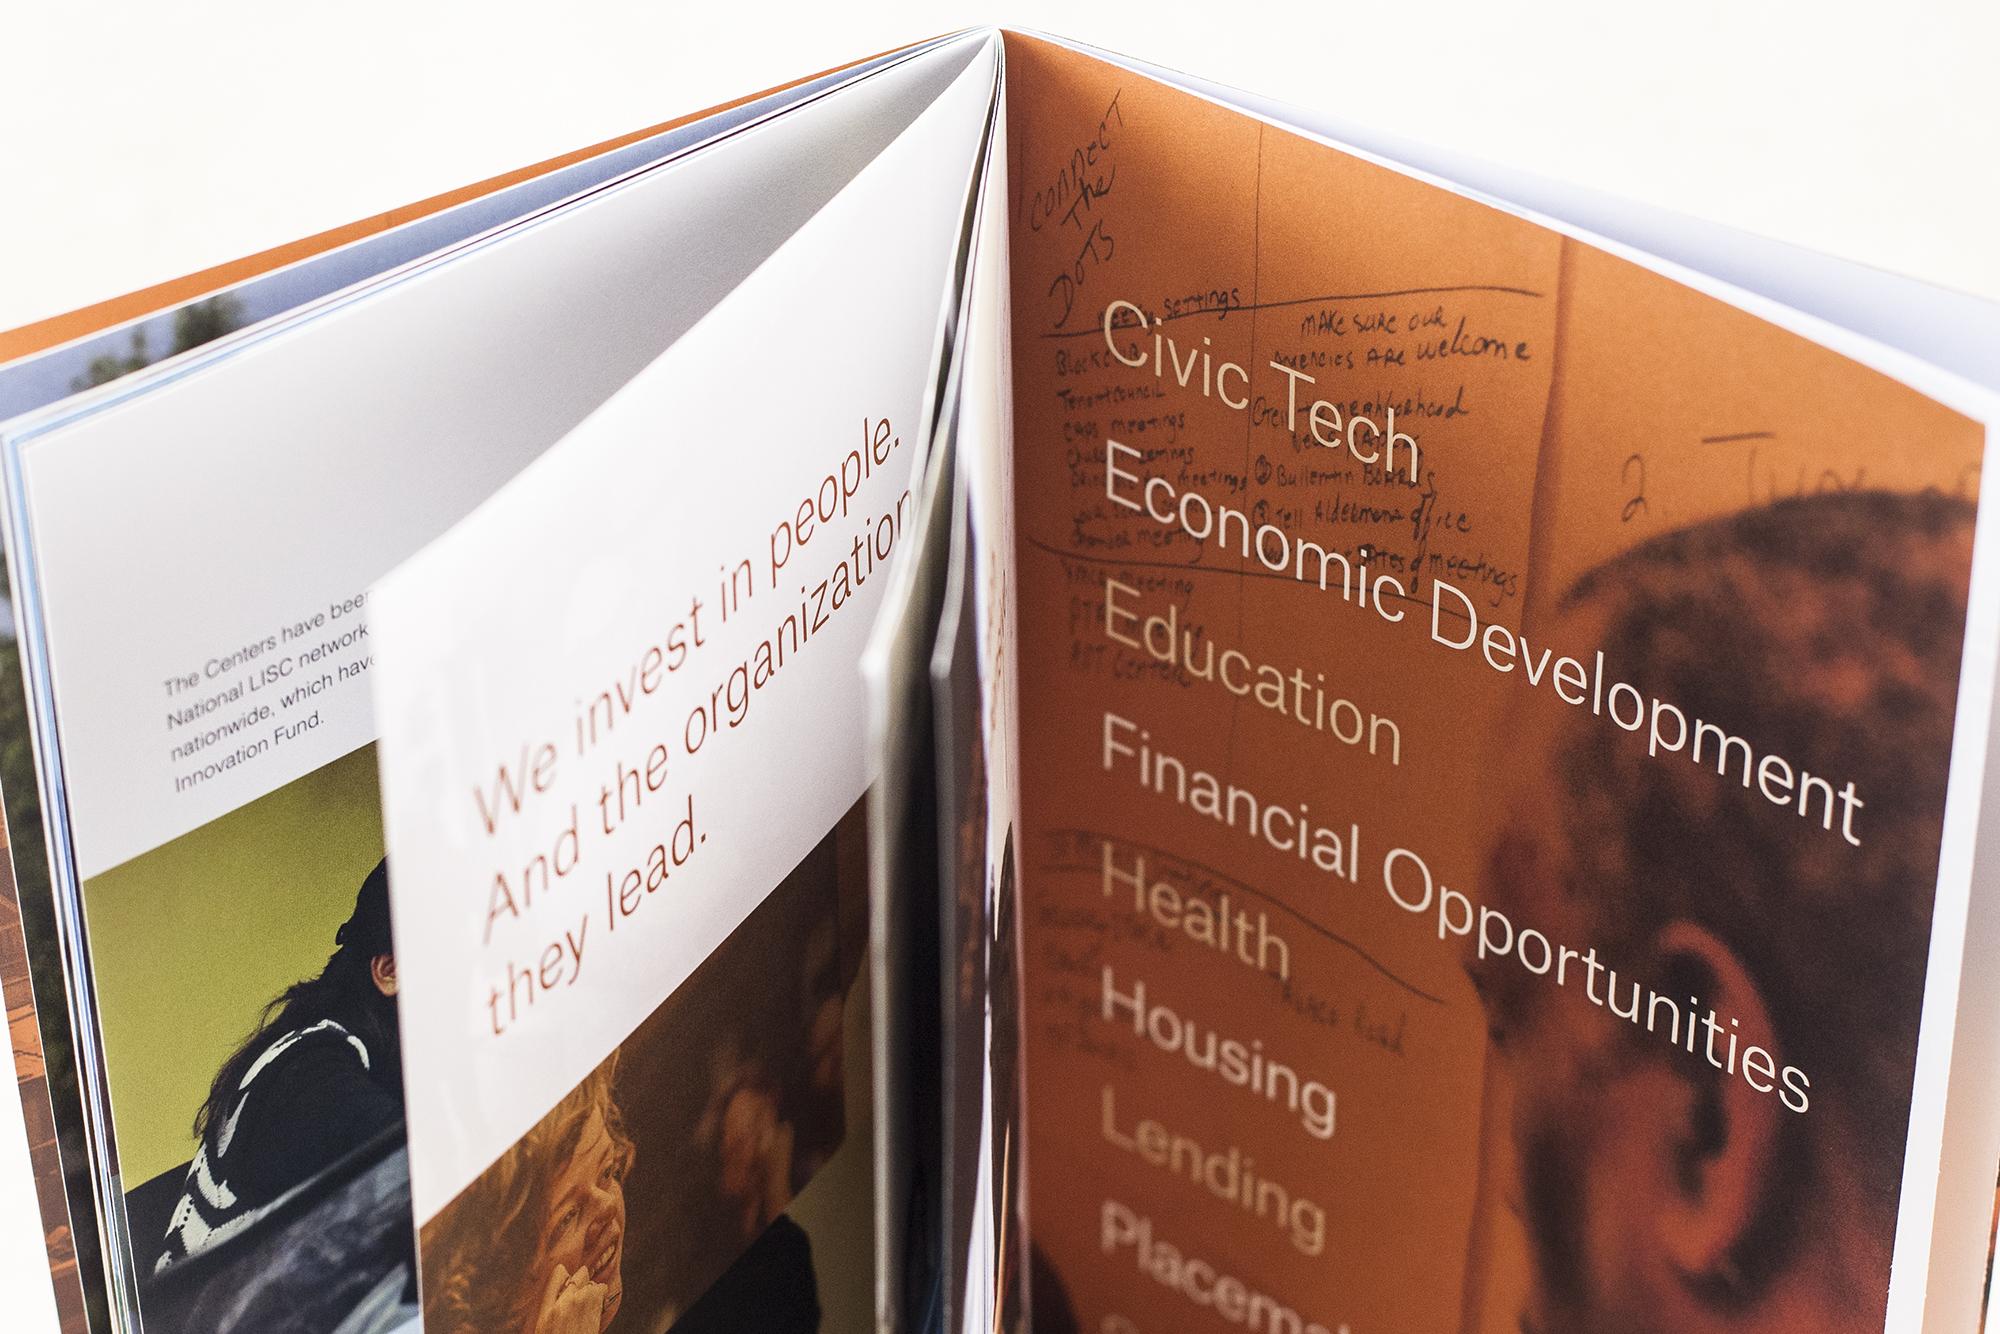 Forward Design Annual Report 12 15-3332 2000.jpg